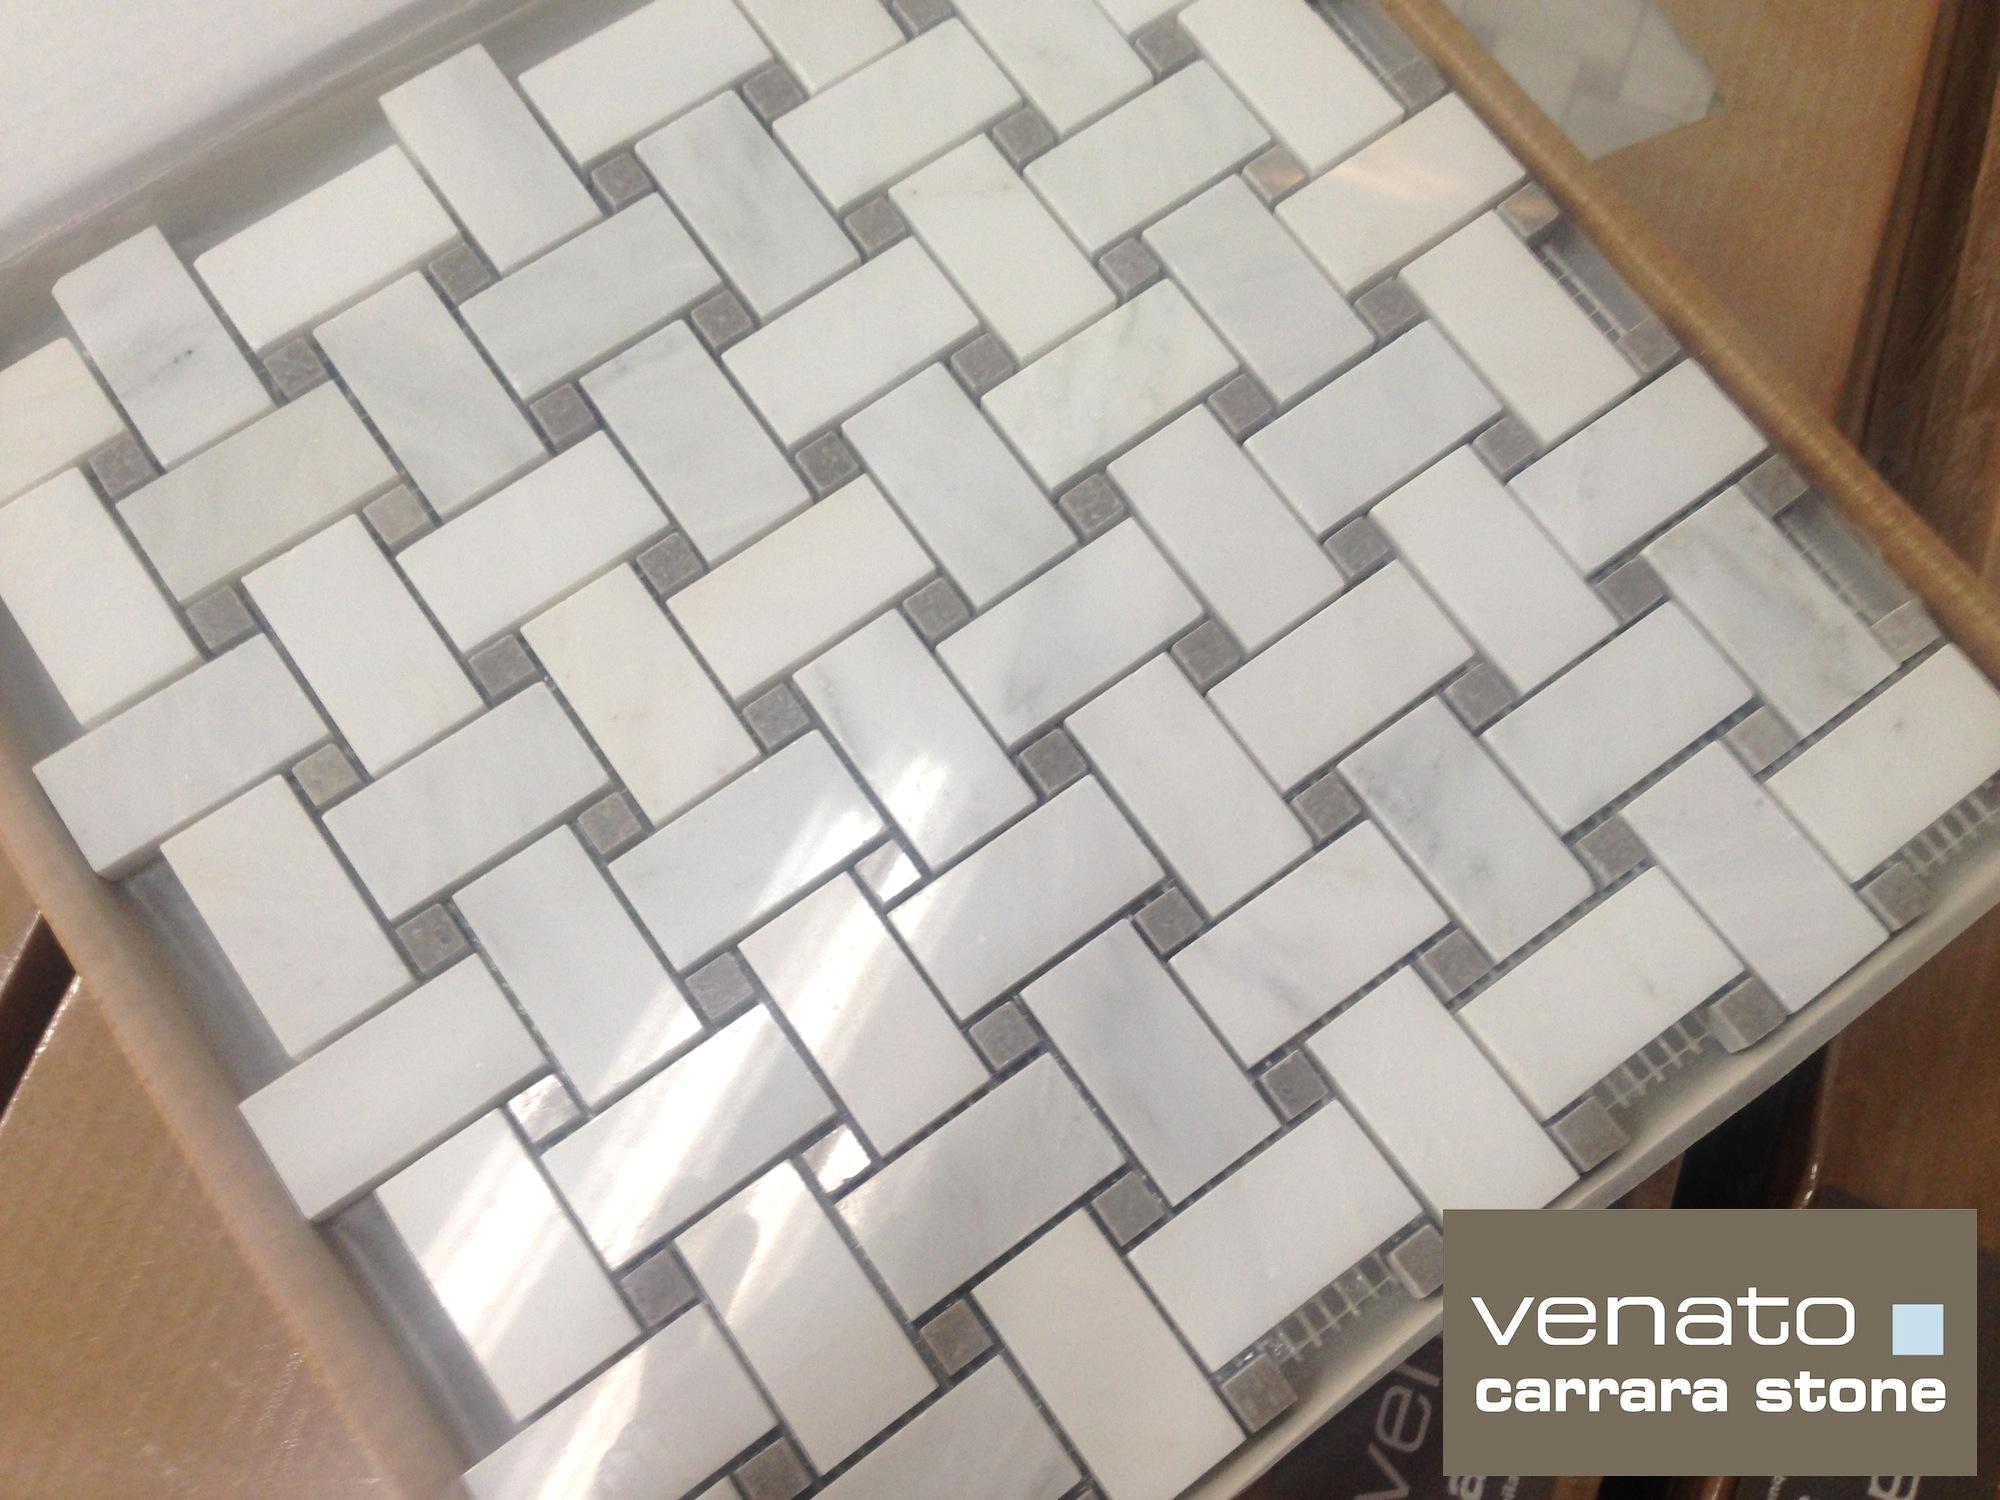 Carrara Venato 1 2 Bursa Beige Basketweave Mosaic Tile The Builder Depot Blog